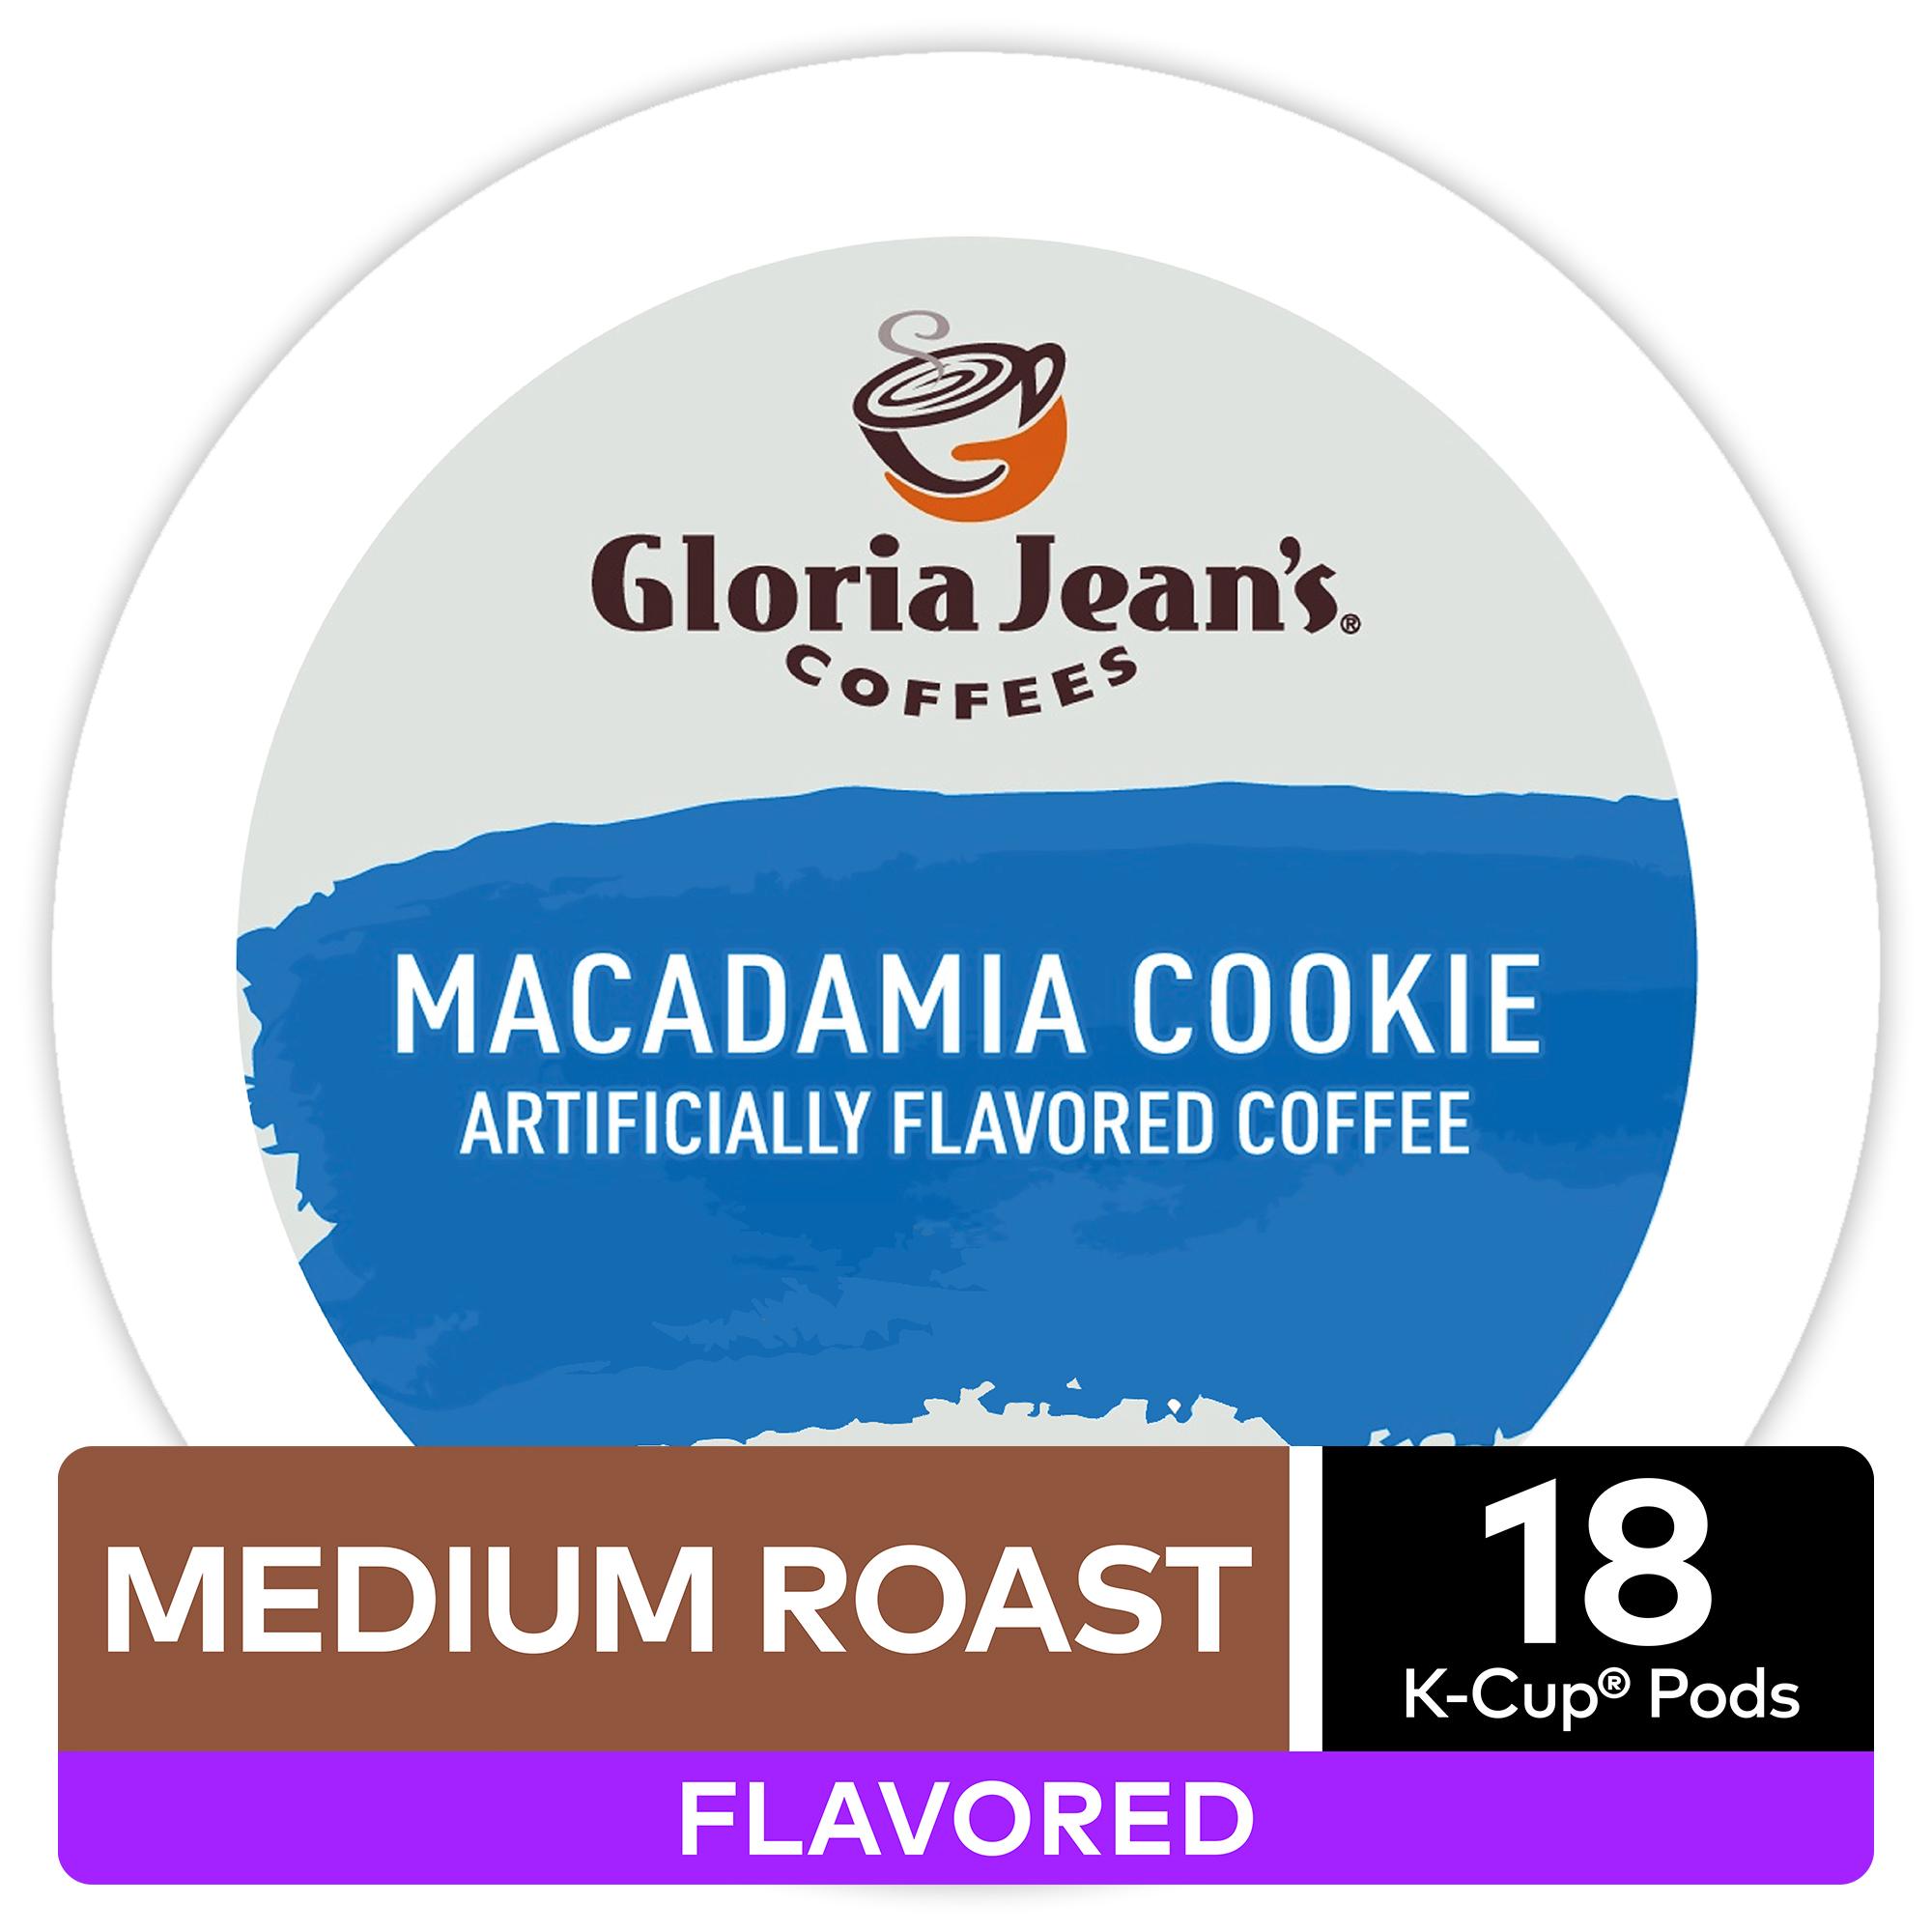 Gloria Jeans Coffees Macadamia Cookie Flavored Coffee, Keurig K-Cup Pods, Medium Roast, 18 Count